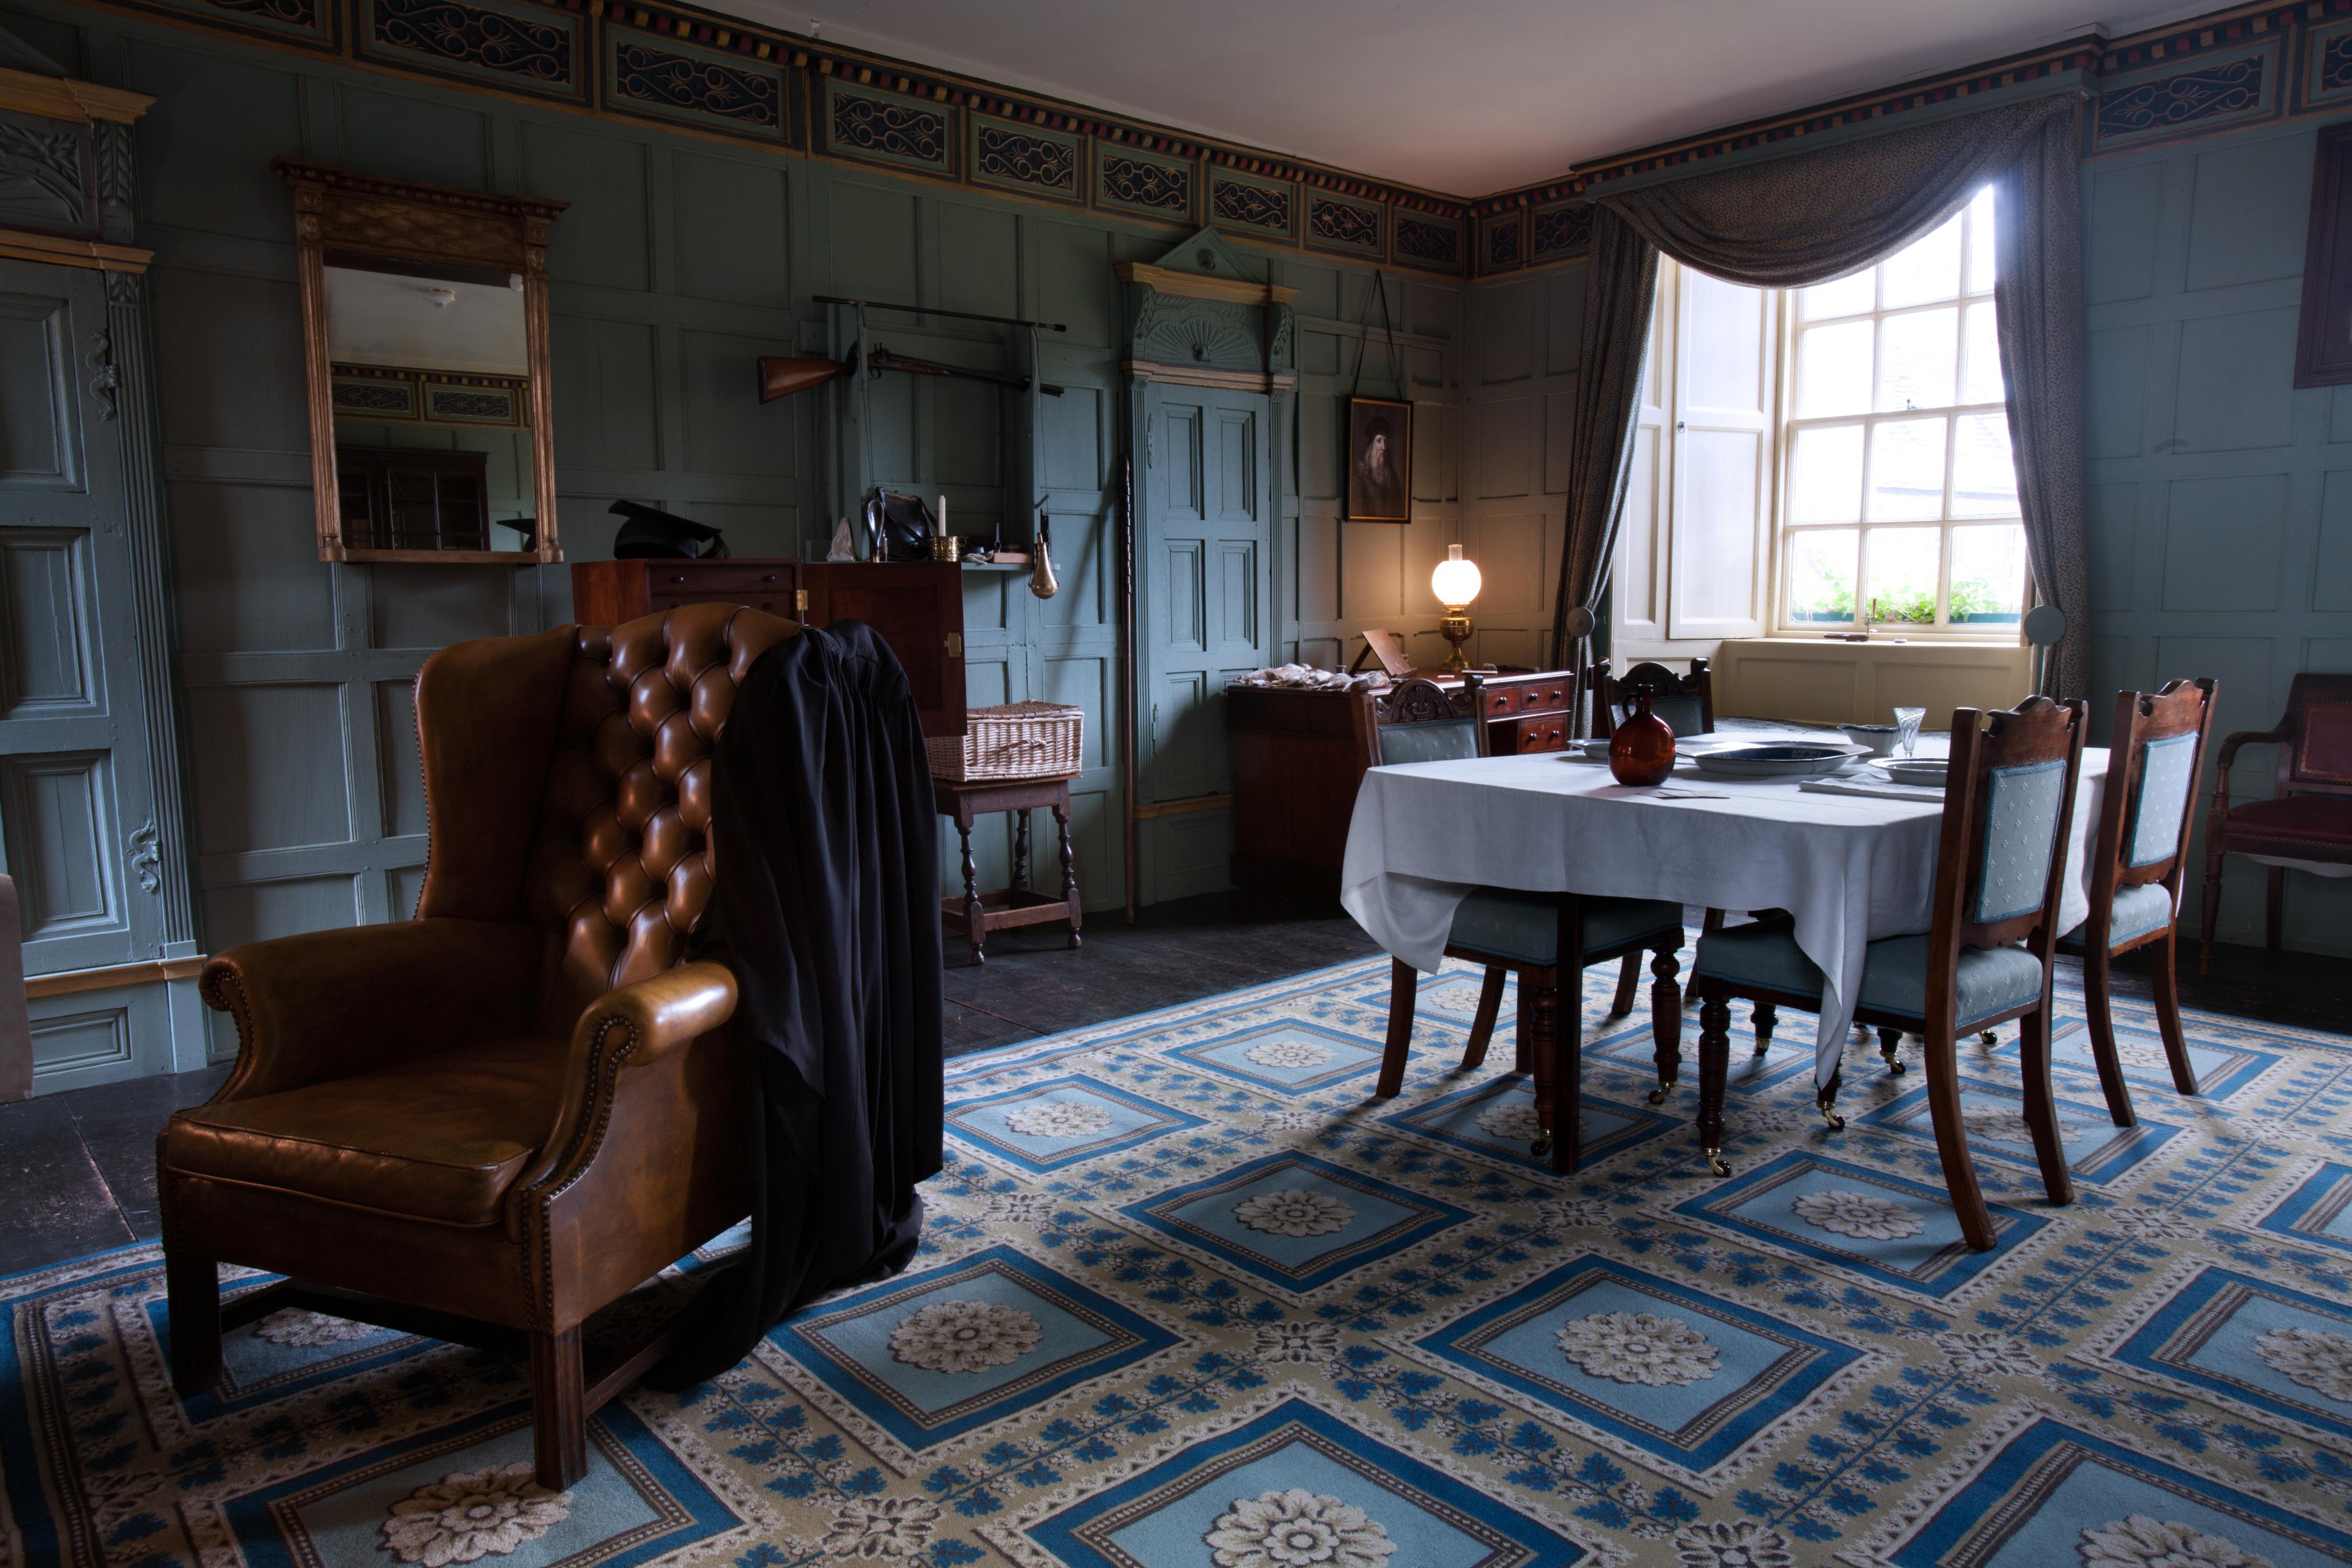 Darwin S Room On The Beagle